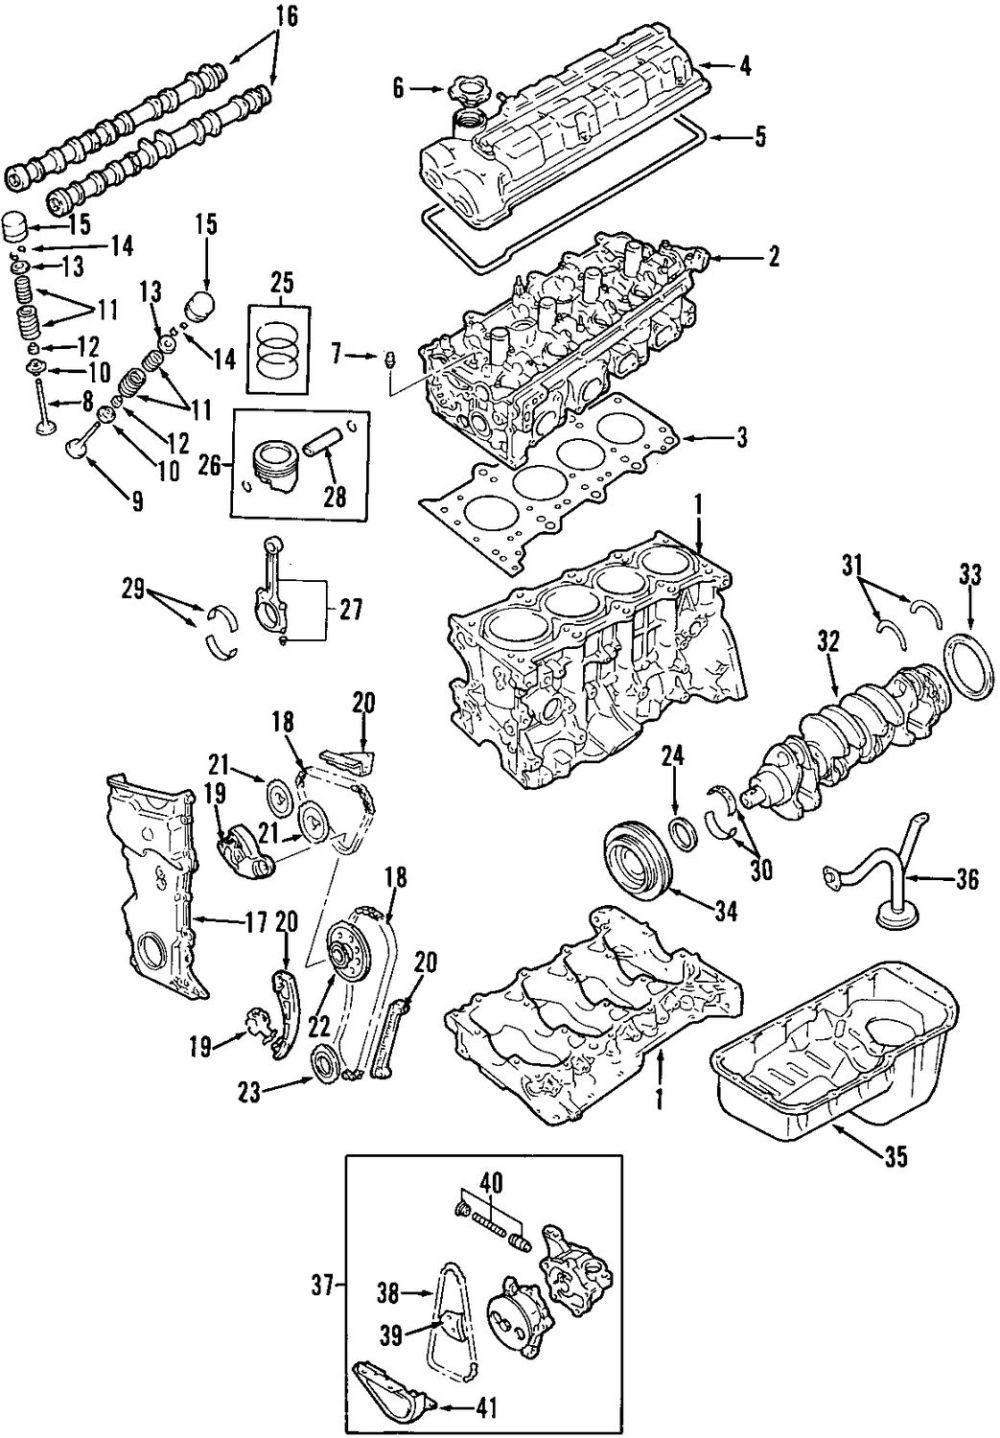 medium resolution of genuine suzuki bearings suz 12100858240a0